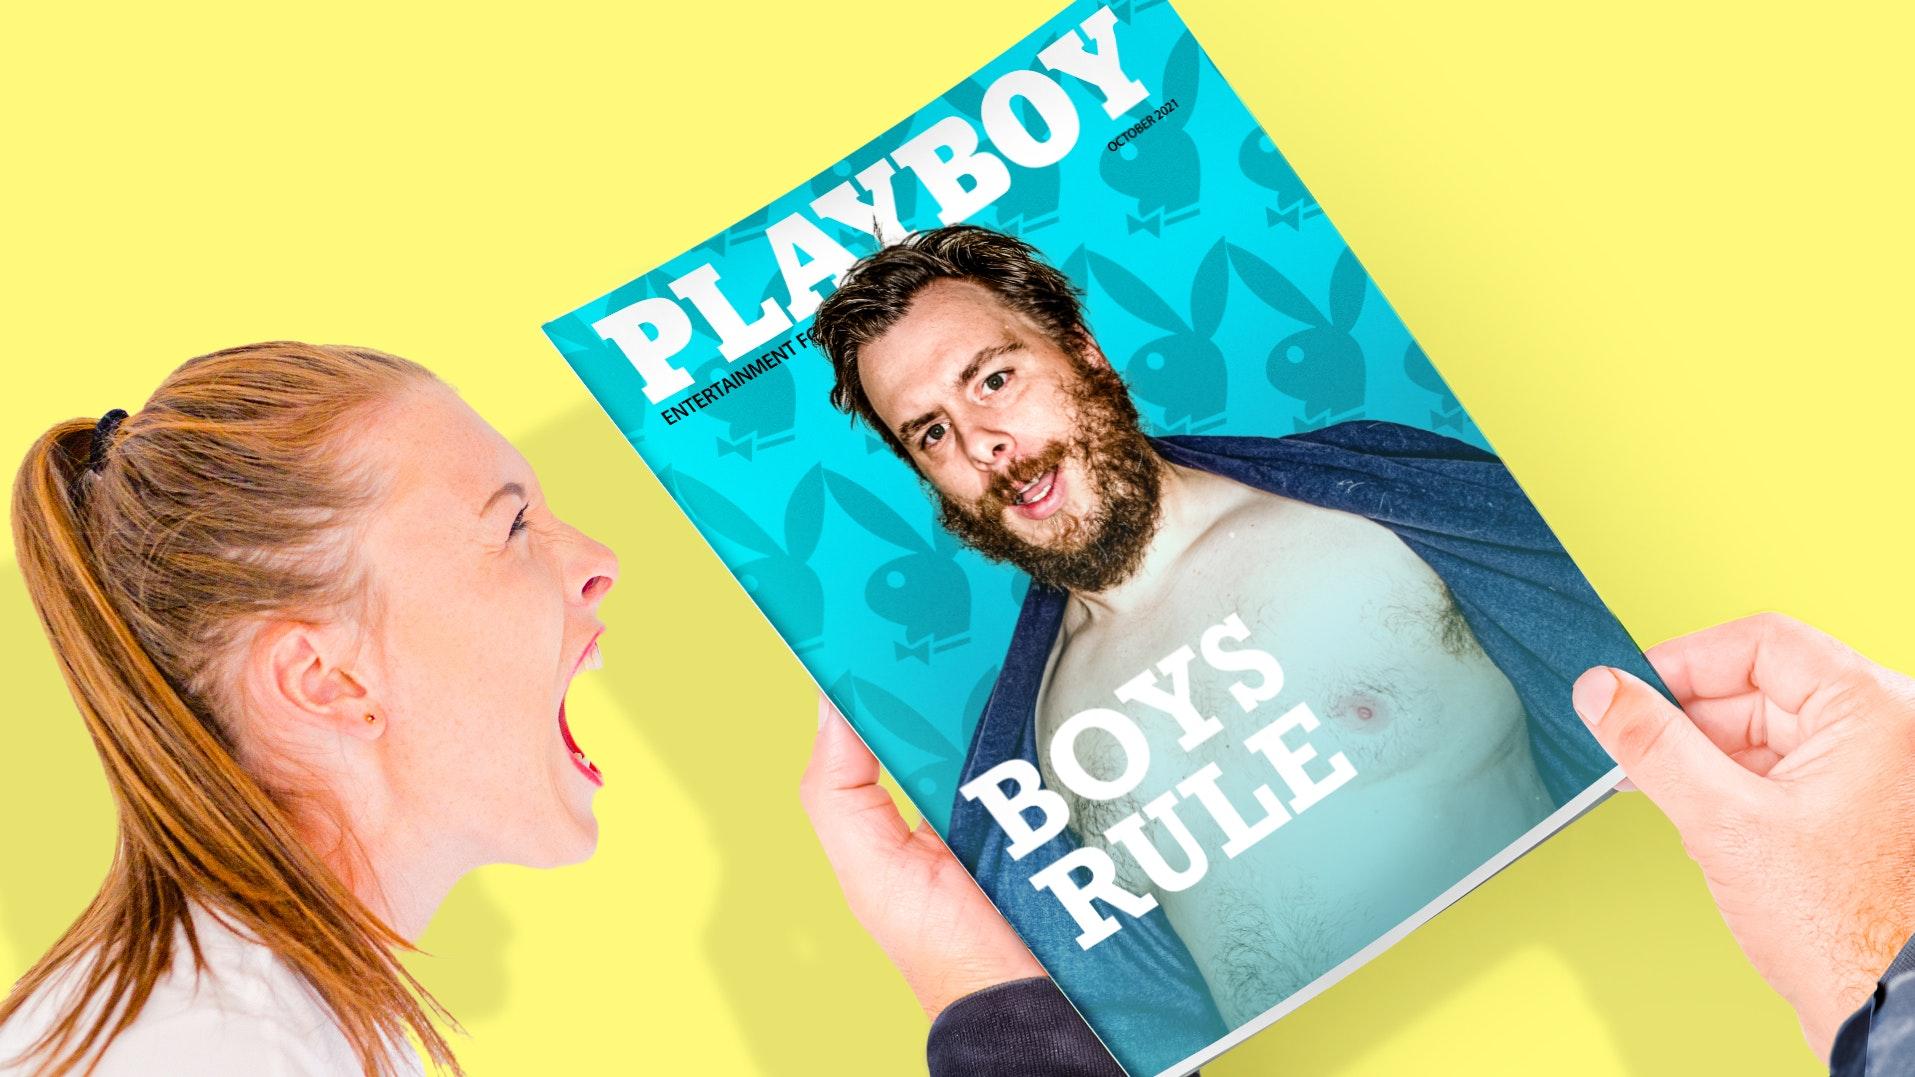 Ep. 857 -Playboy Thinks Men AreBetter Than Women